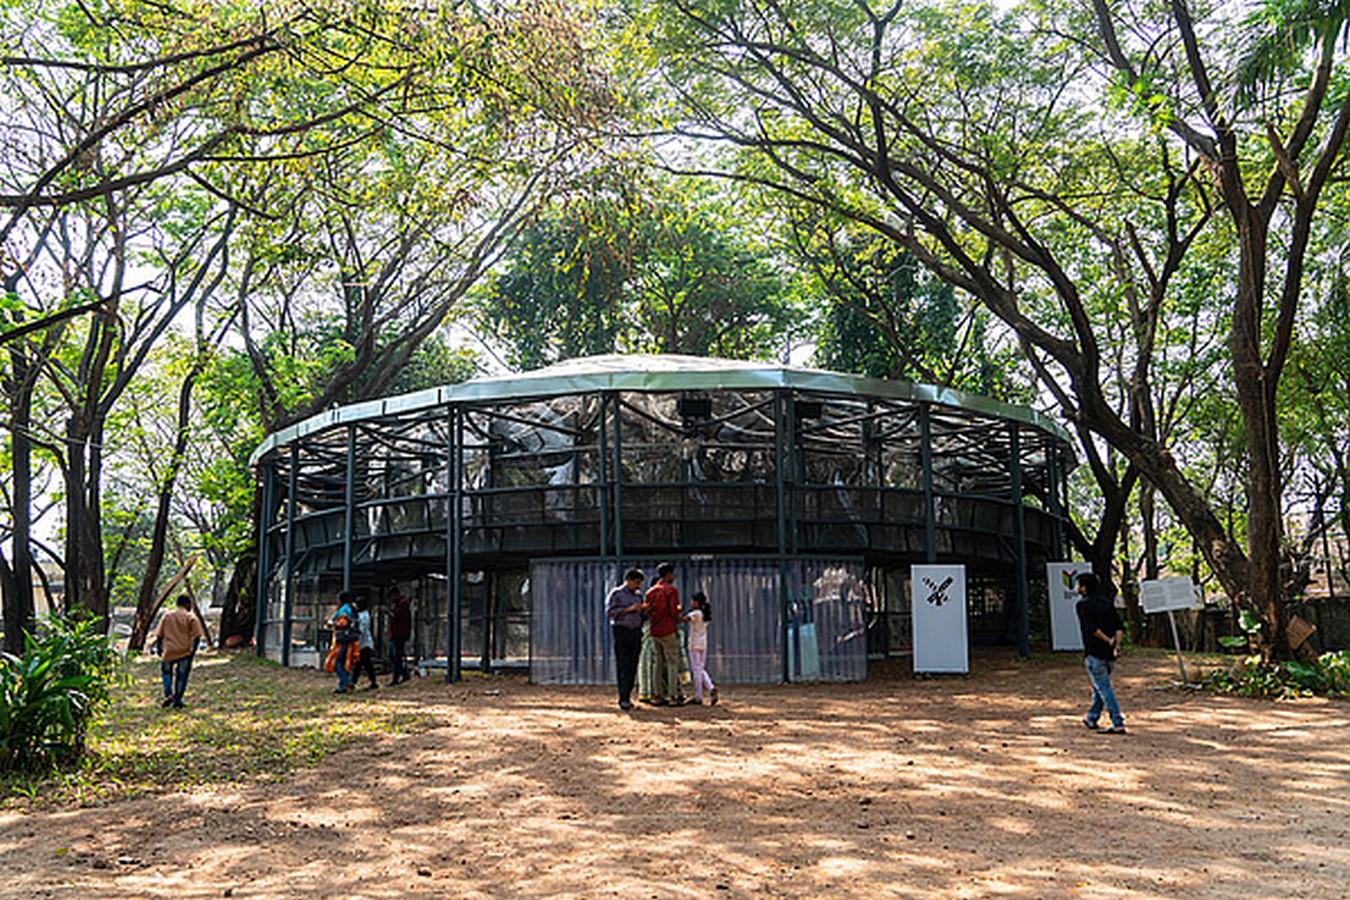 Kochi-Muzris Biennale: The face of Contemporary Art in India - Sheet8